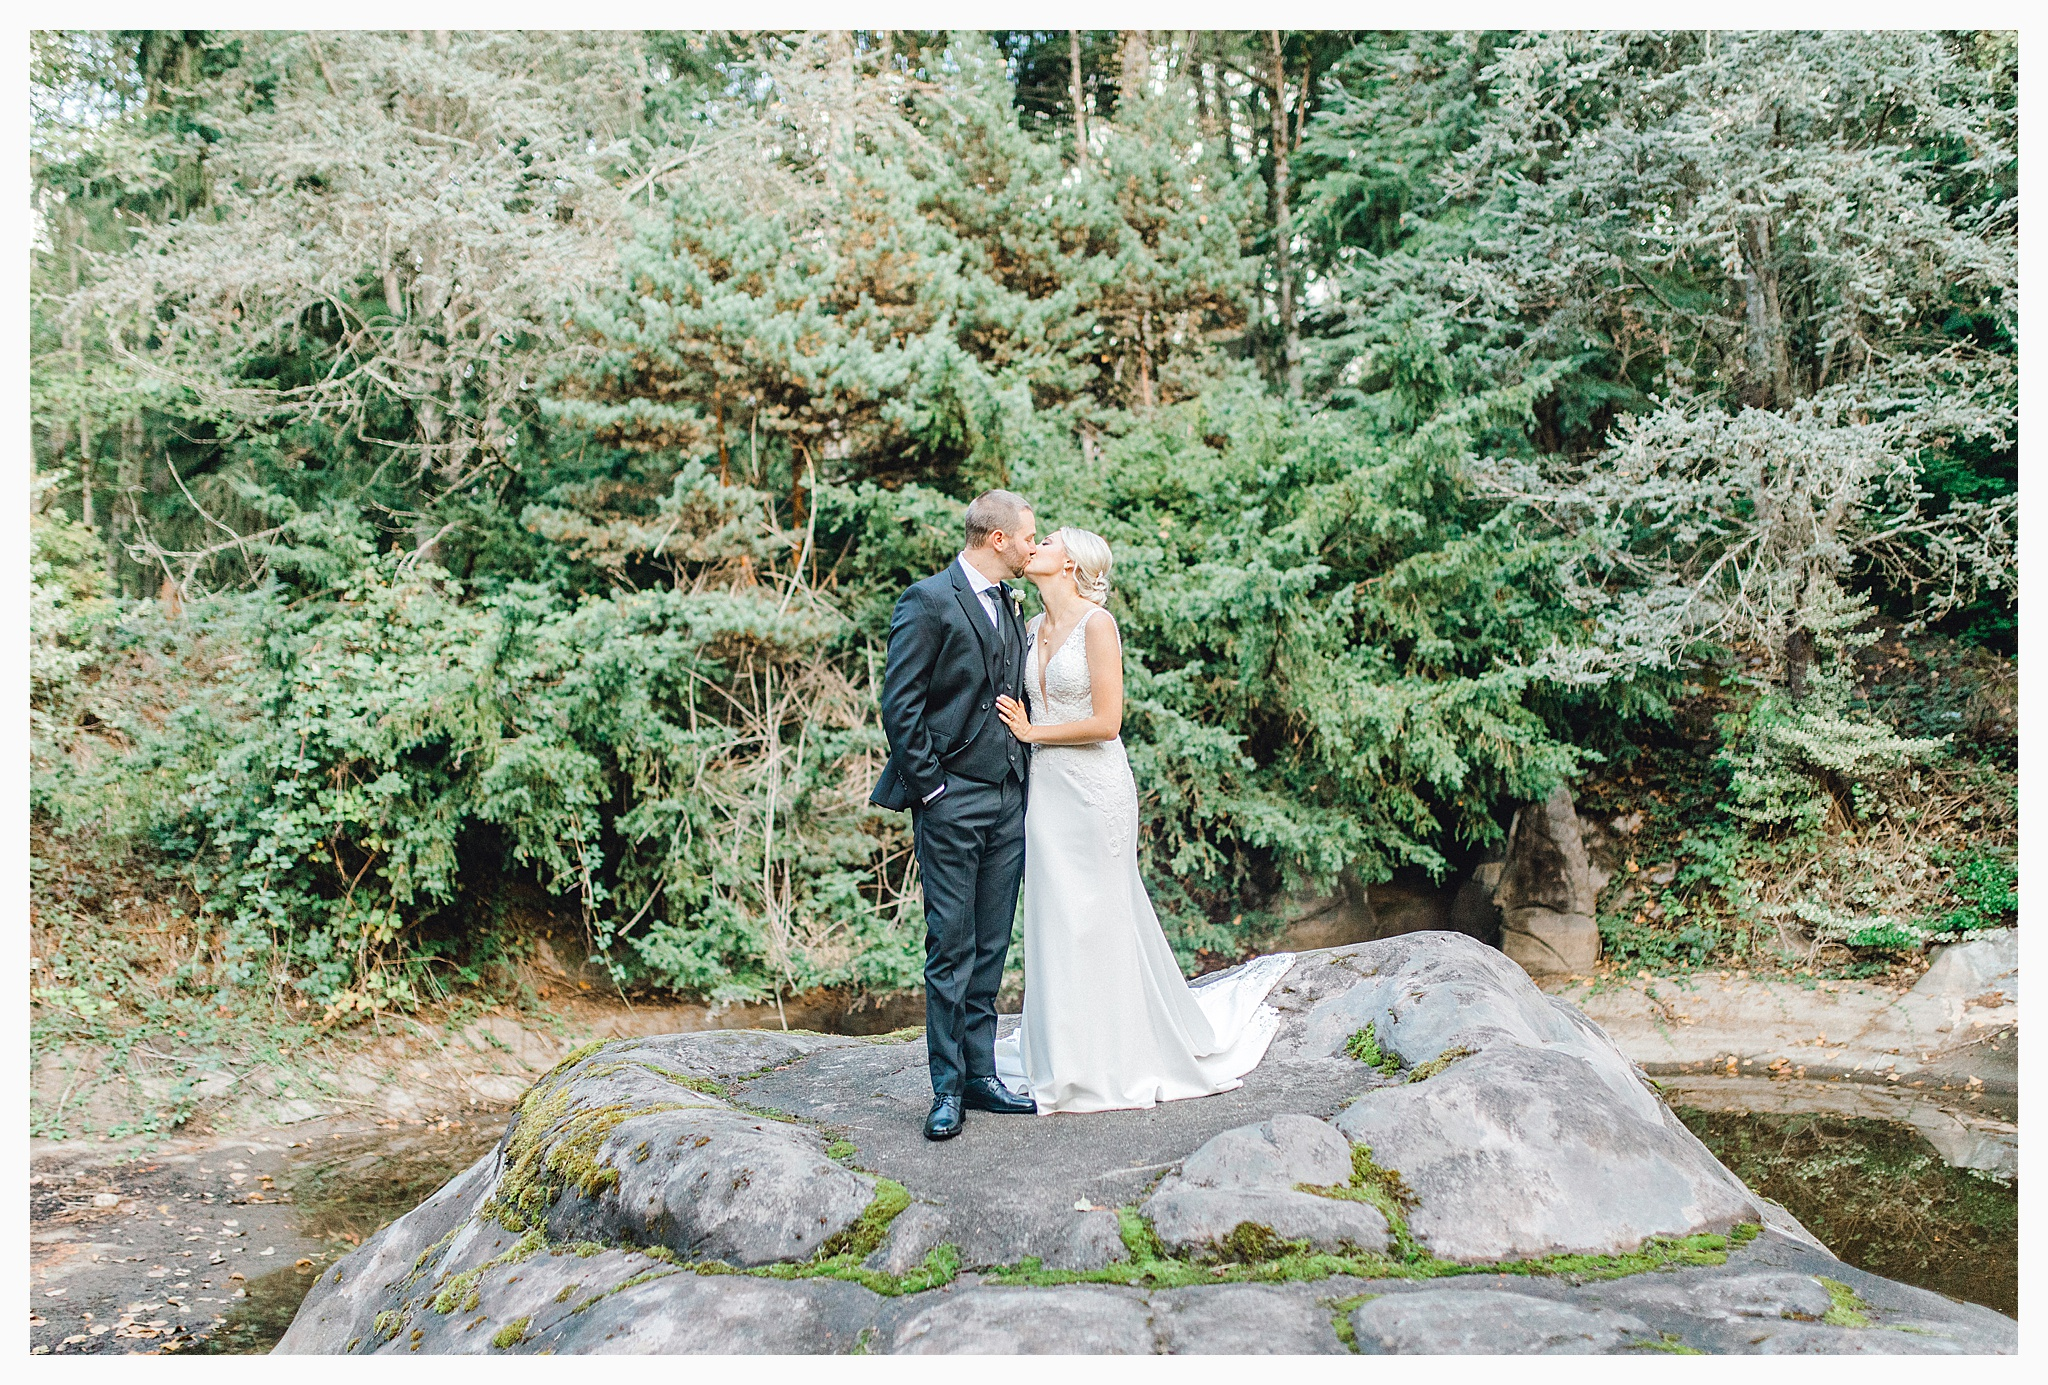 Emma Rose Company Light and Airy Wedding Photographer, Beautiful fall wedding at Rock Creek Gardens Venue in Puyallup, Washington._0037.jpg